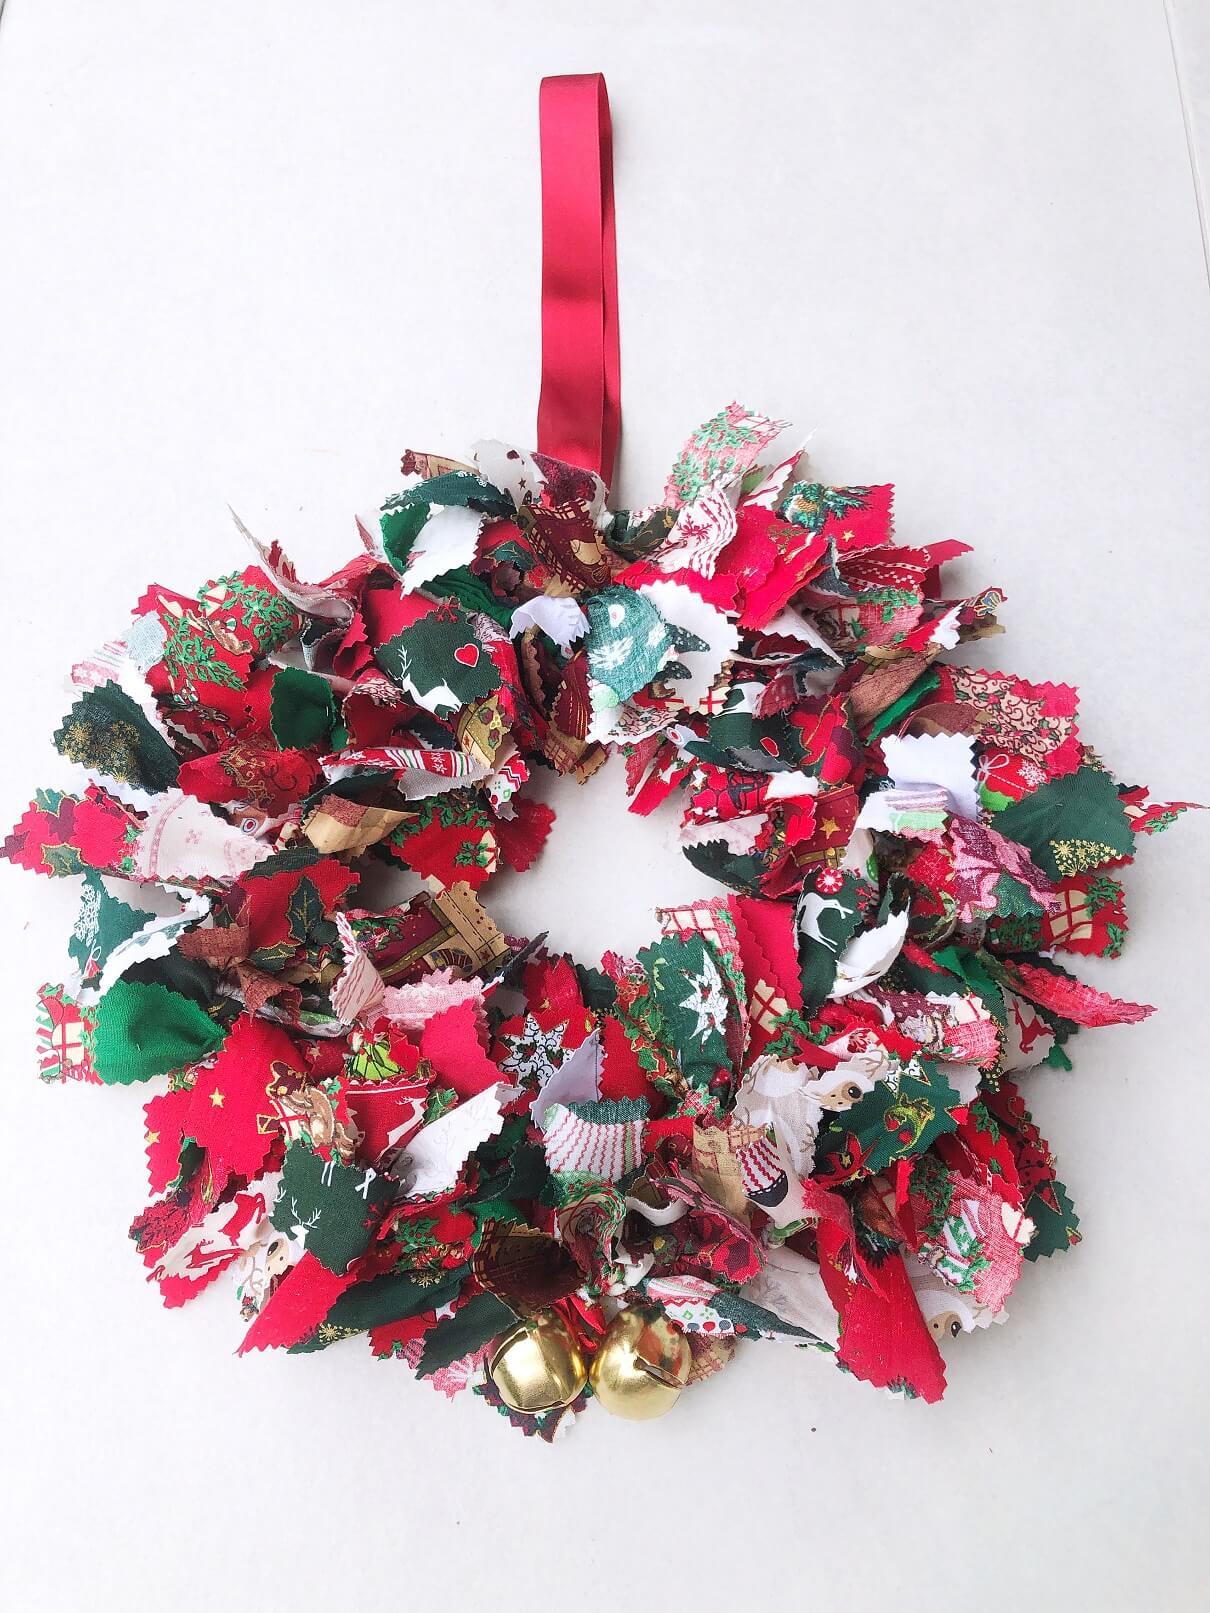 Final Christmas Wreath